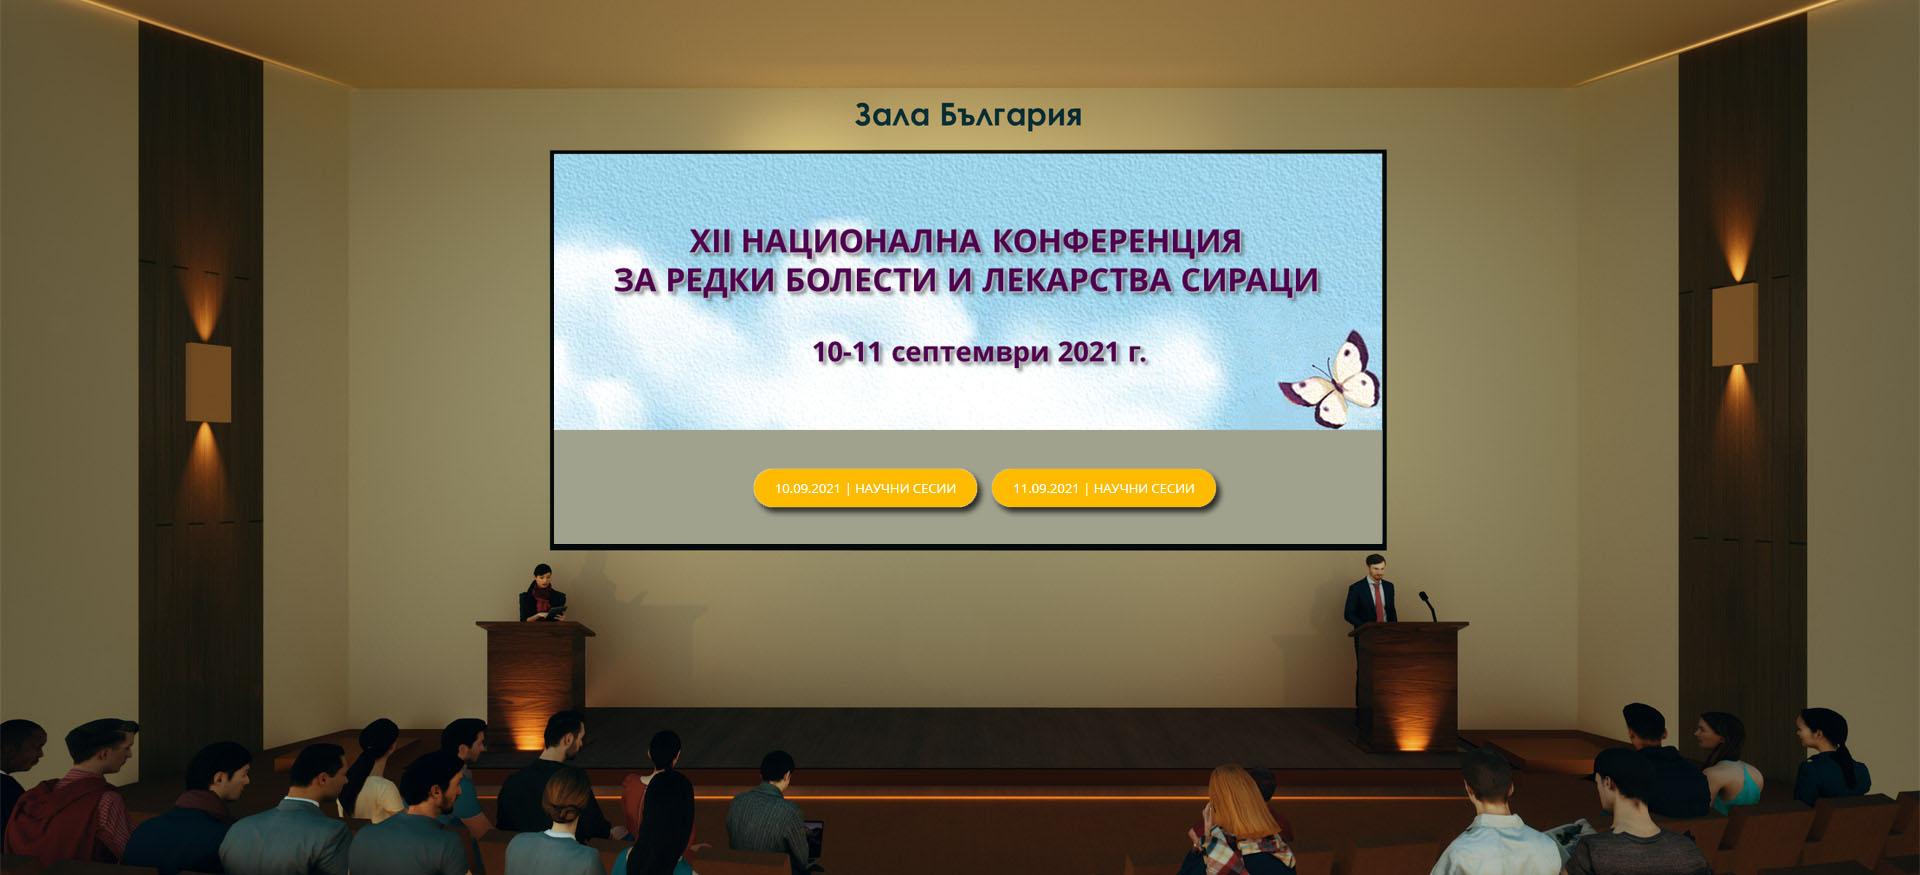 Bulgaria Hall 12НКРБЛС